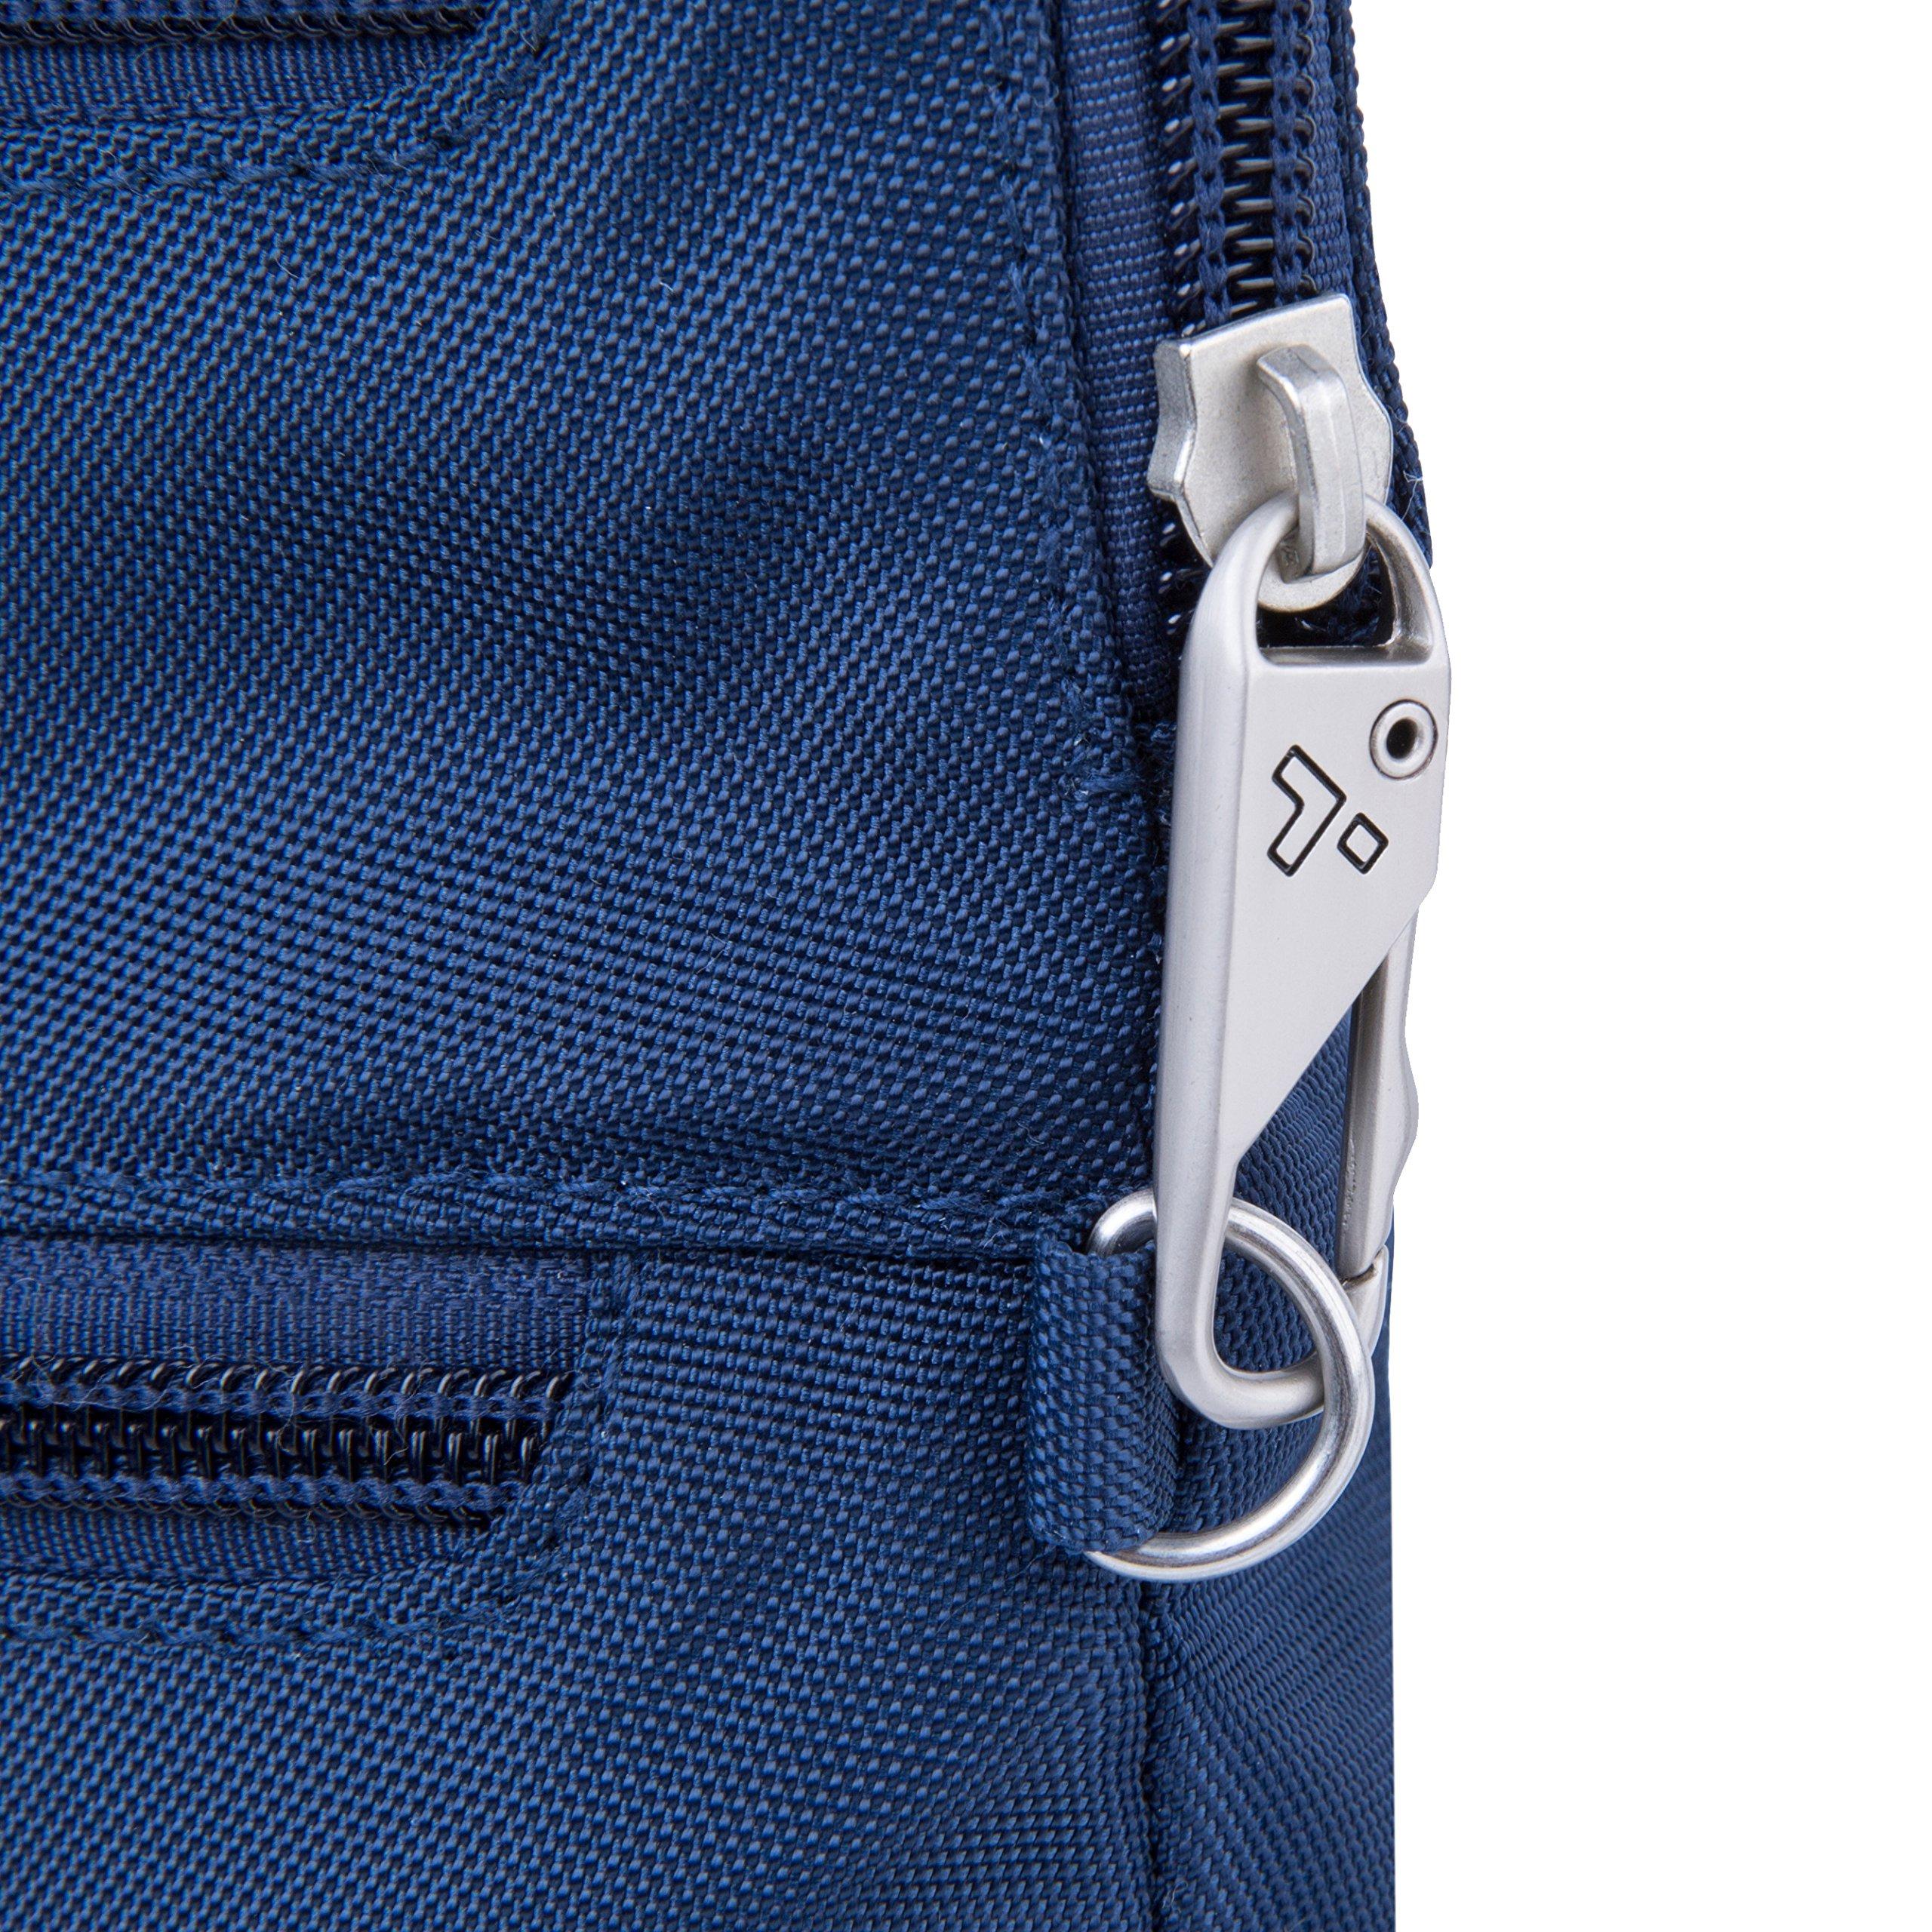 Travelon Anti-Theft Classic Slim Dbl Zip Crossbody Bag, Midnight by Travelon (Image #6)